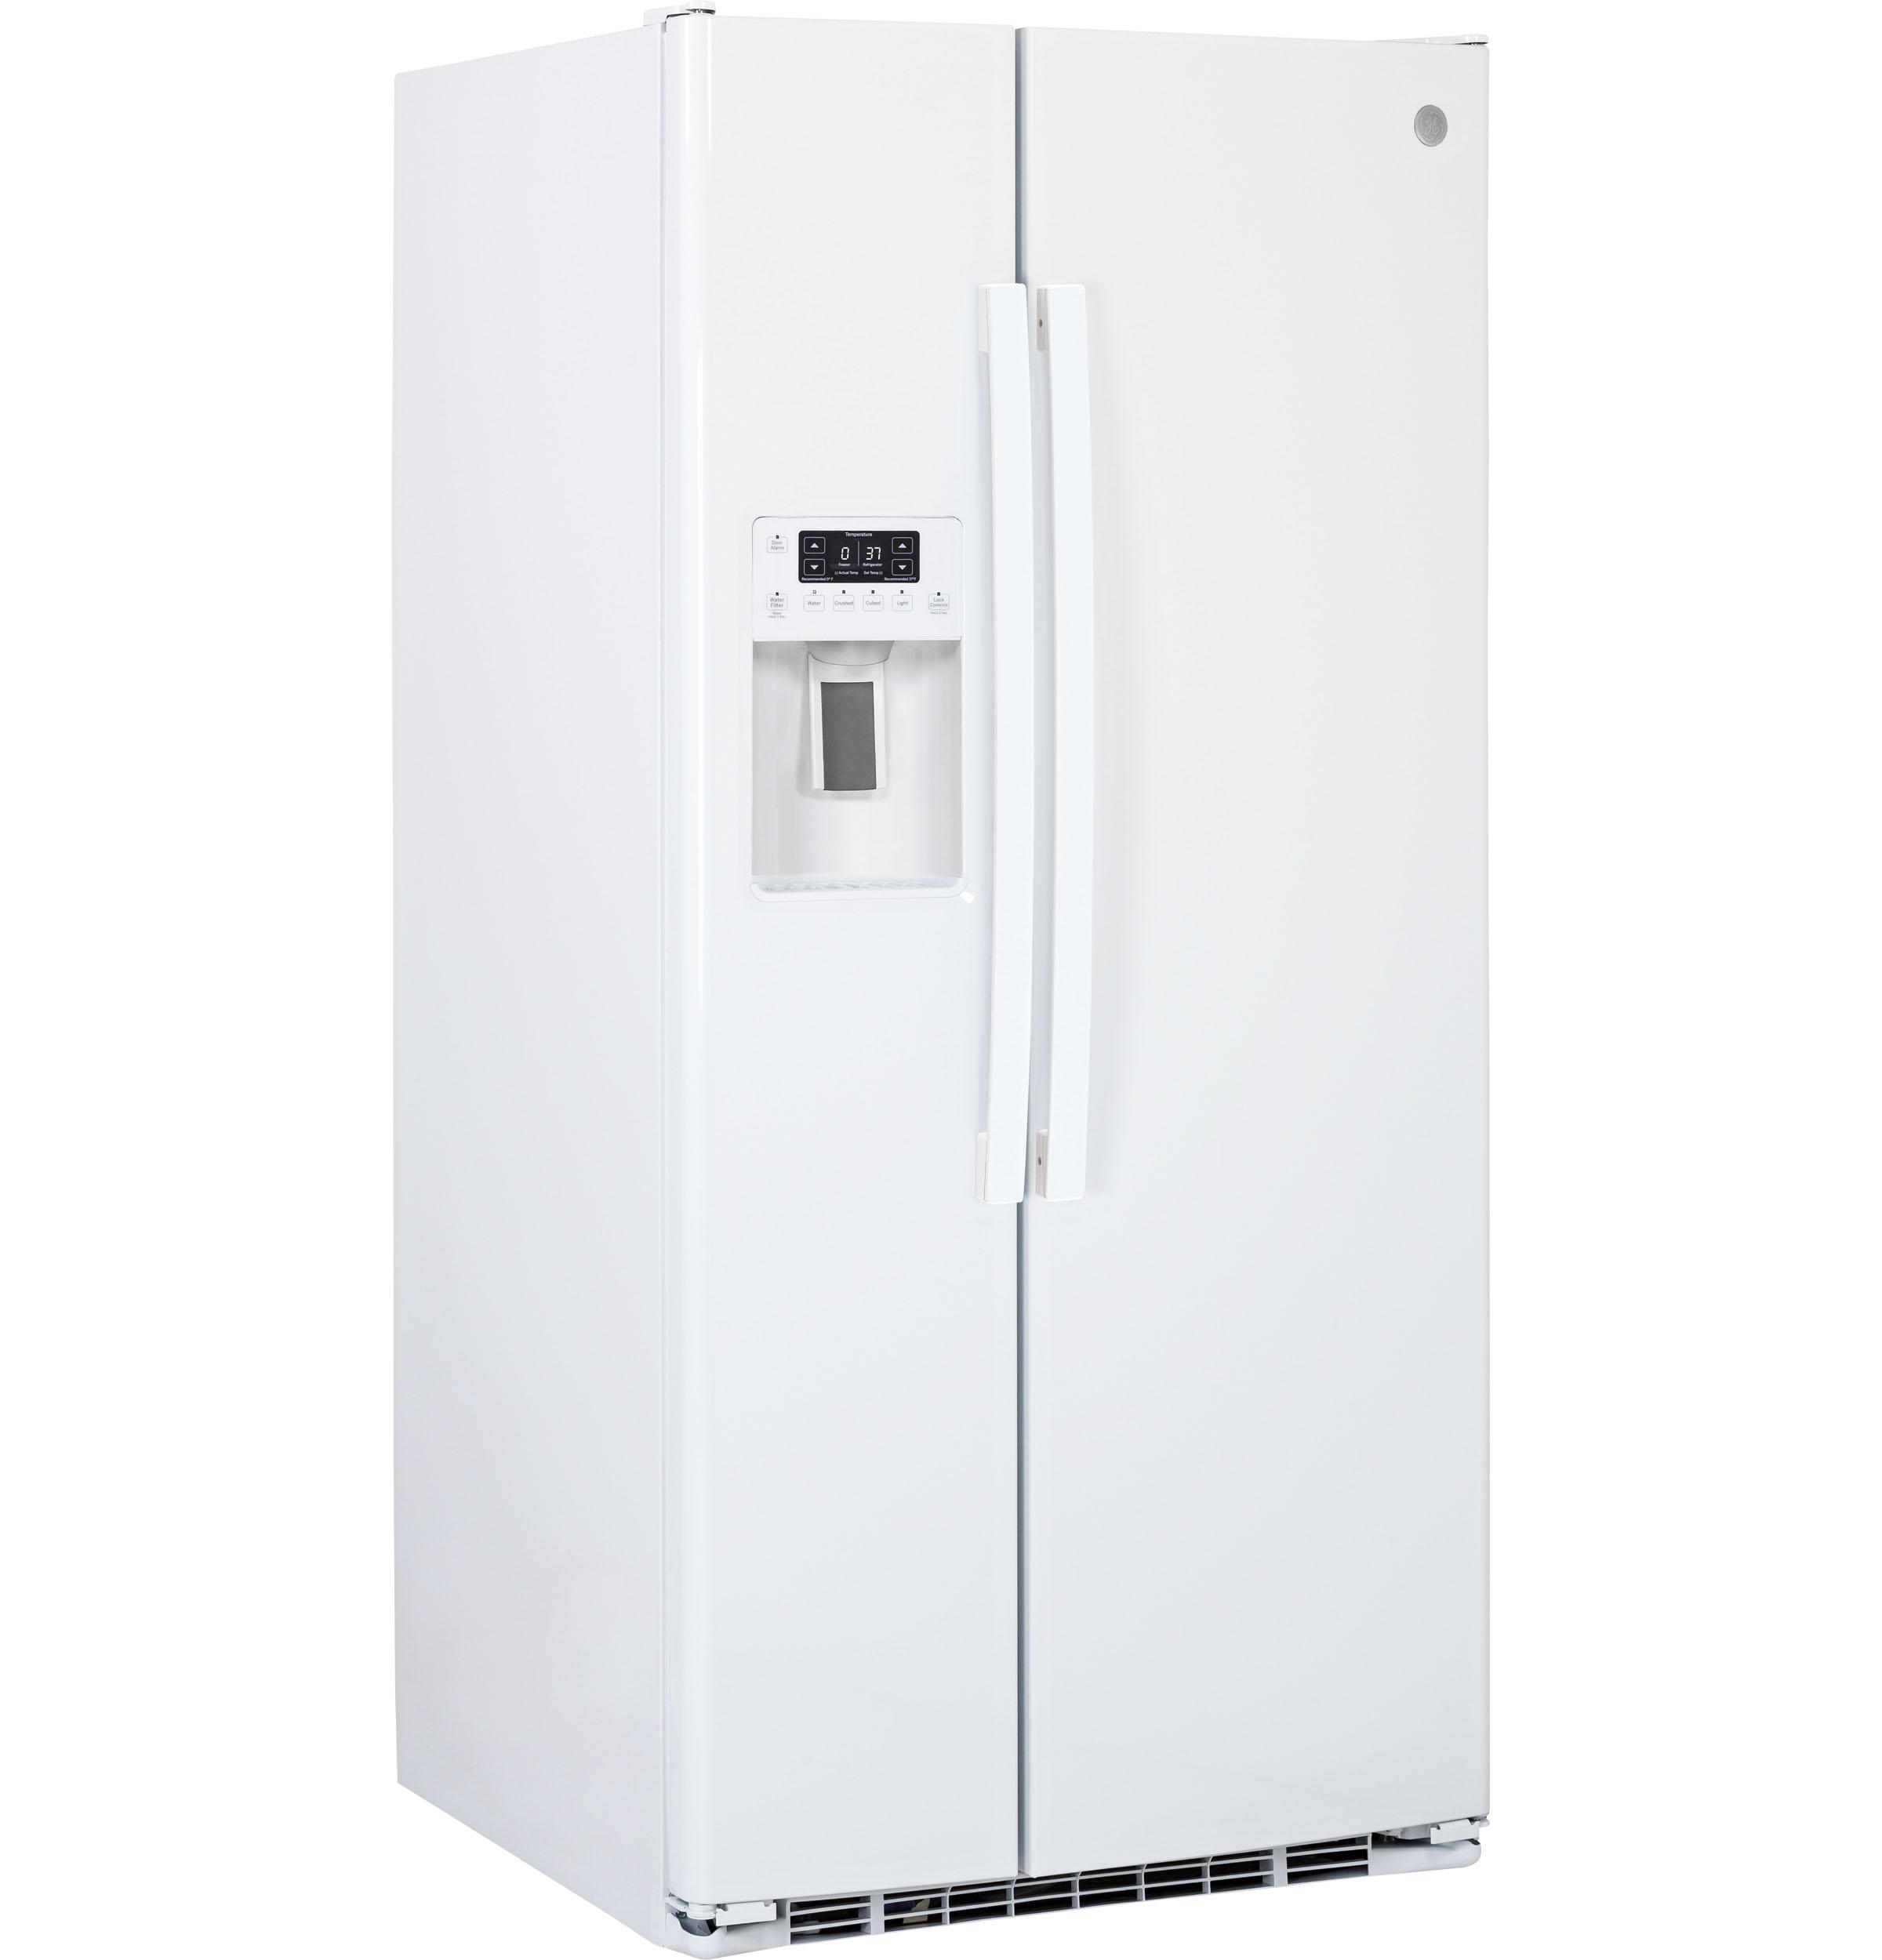 Model: GSE23GGKWW   GE GE® ENERGY STAR® 23.2 Cu. Ft. Side-By-Side Refrigerator